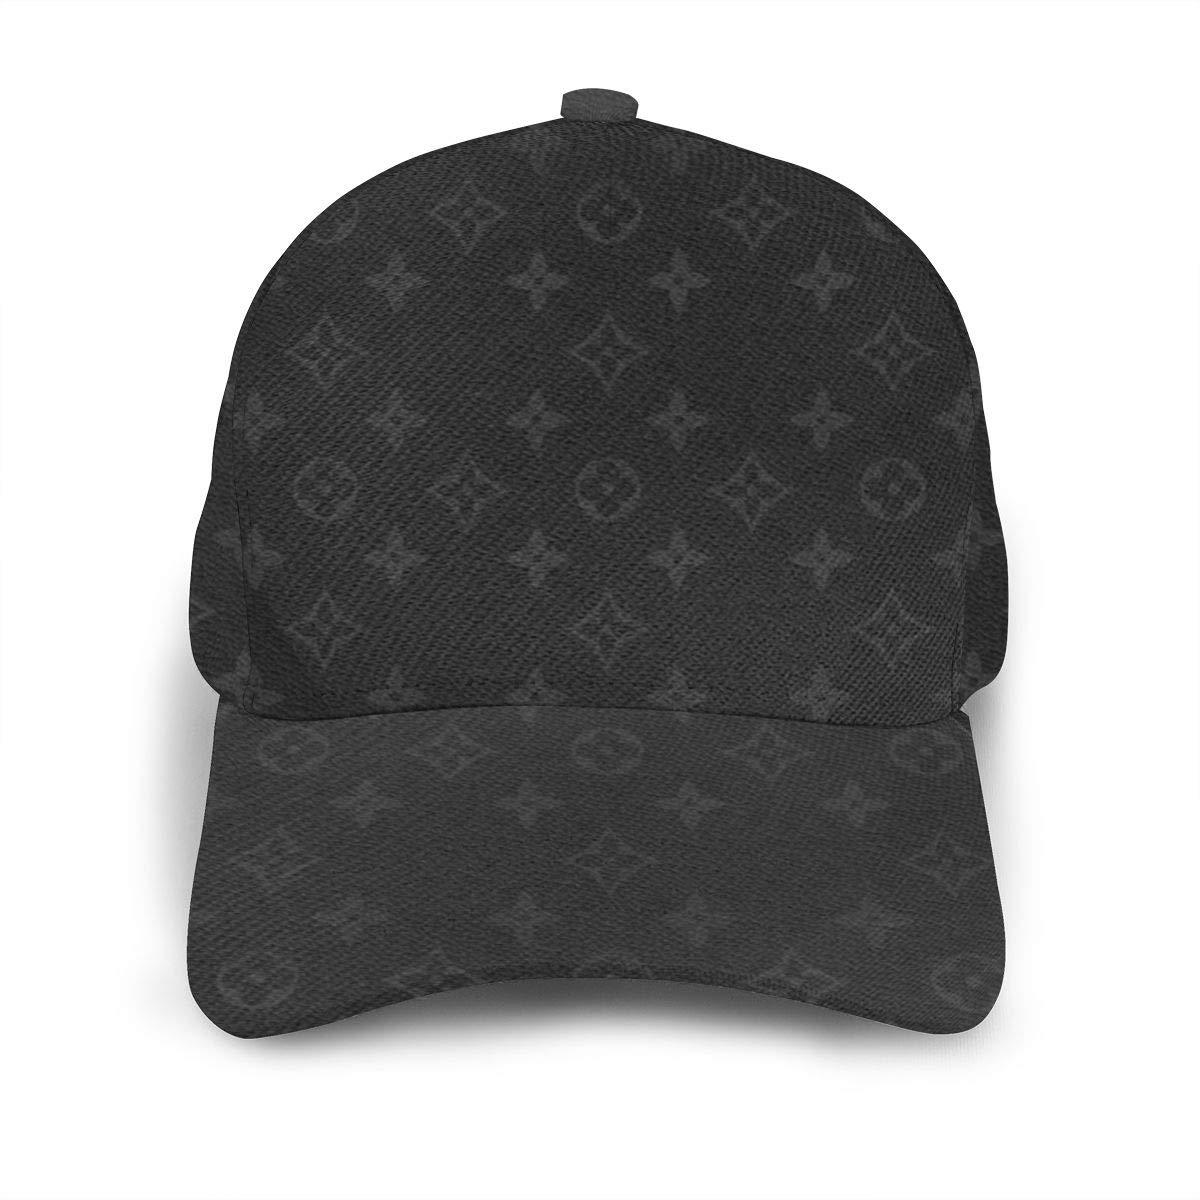 ELVg Unisex Classic Trucker Hat Adjustable Strapback Hat Dad Baseball Caps Black